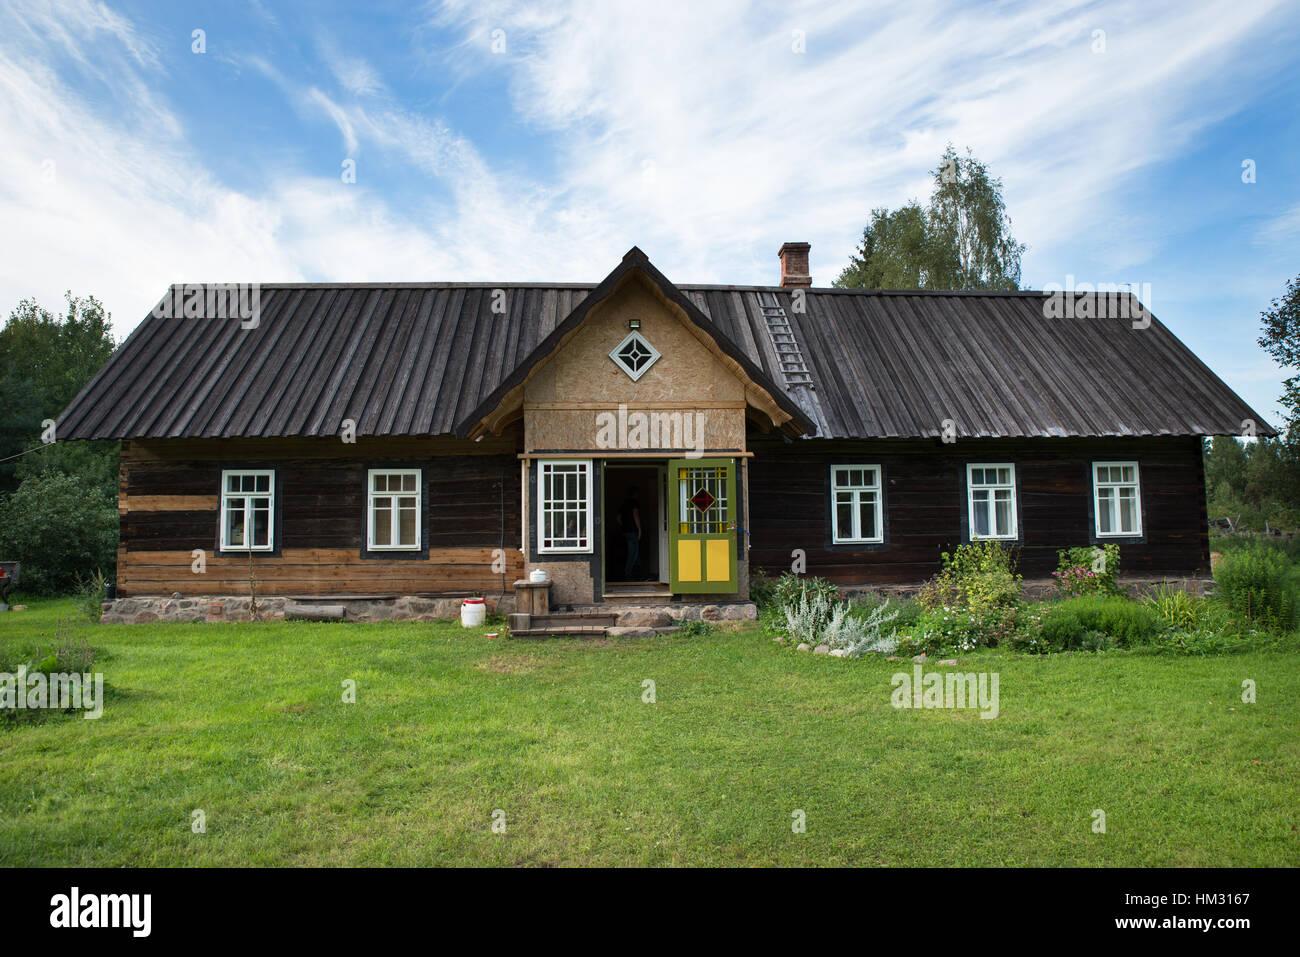 Traditional wooden house of Seto people, Obinitsa, Estonia - Stock Image